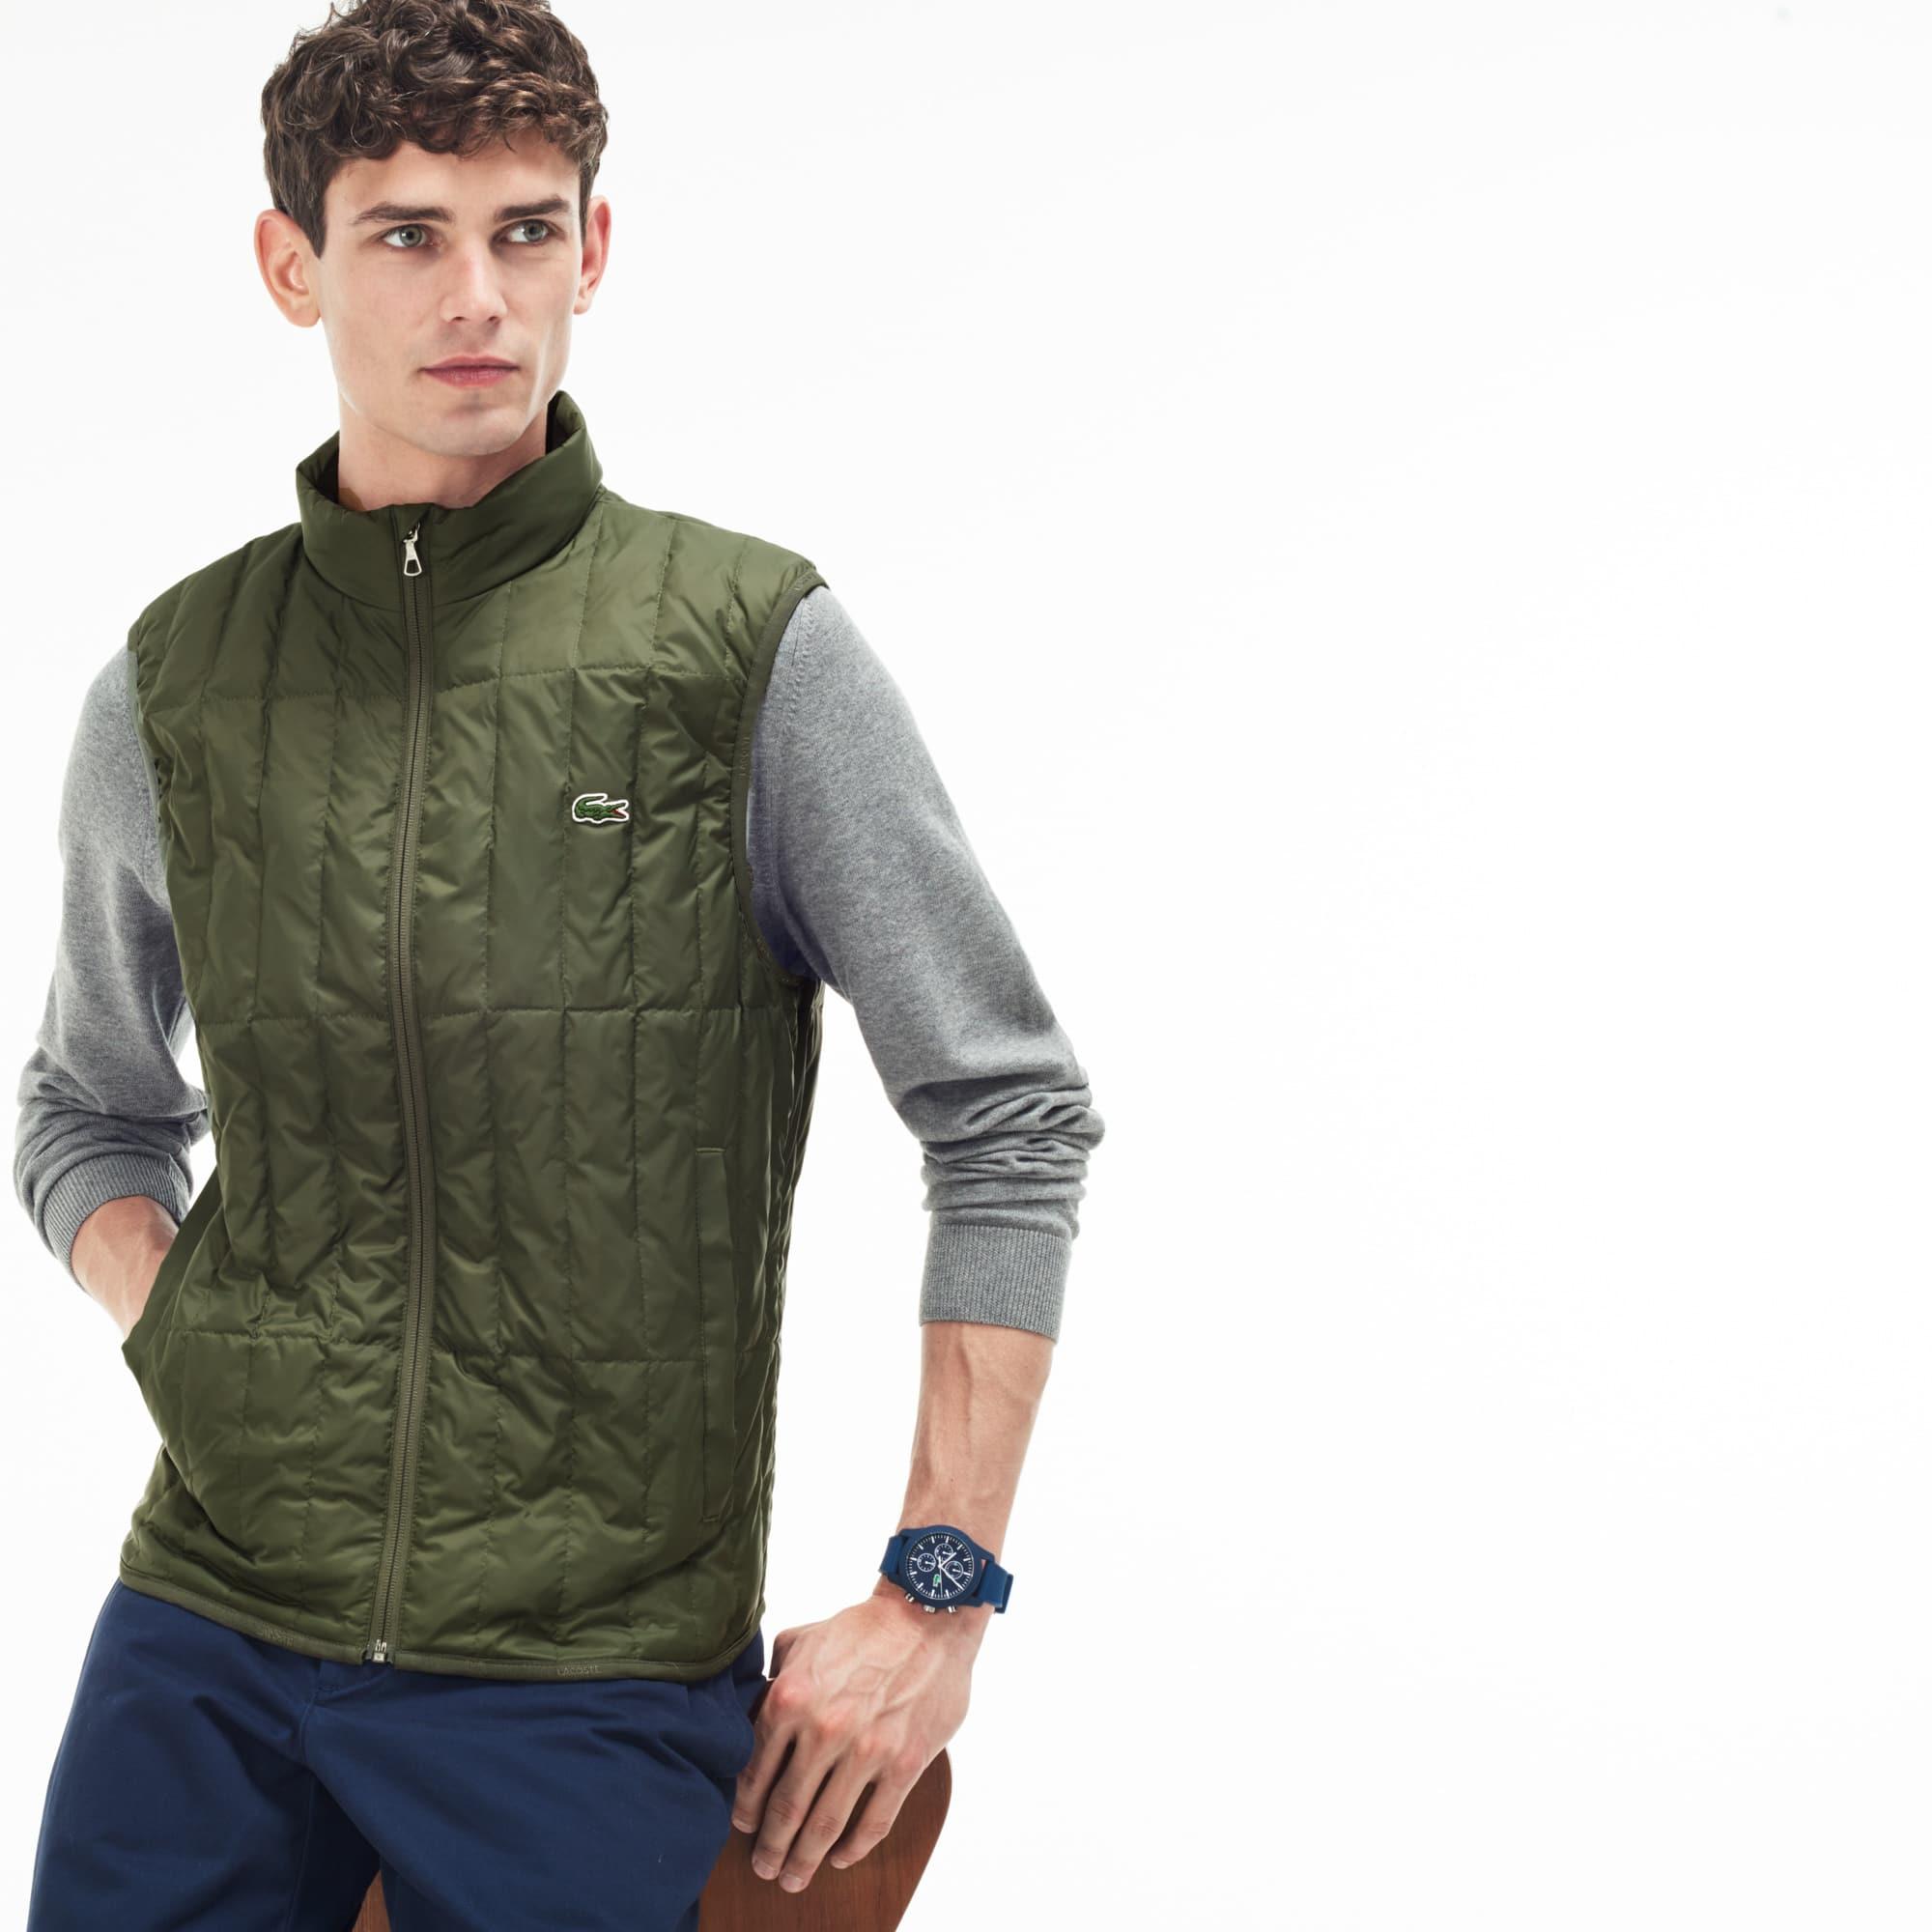 Men's Lightweight Quilted Vest